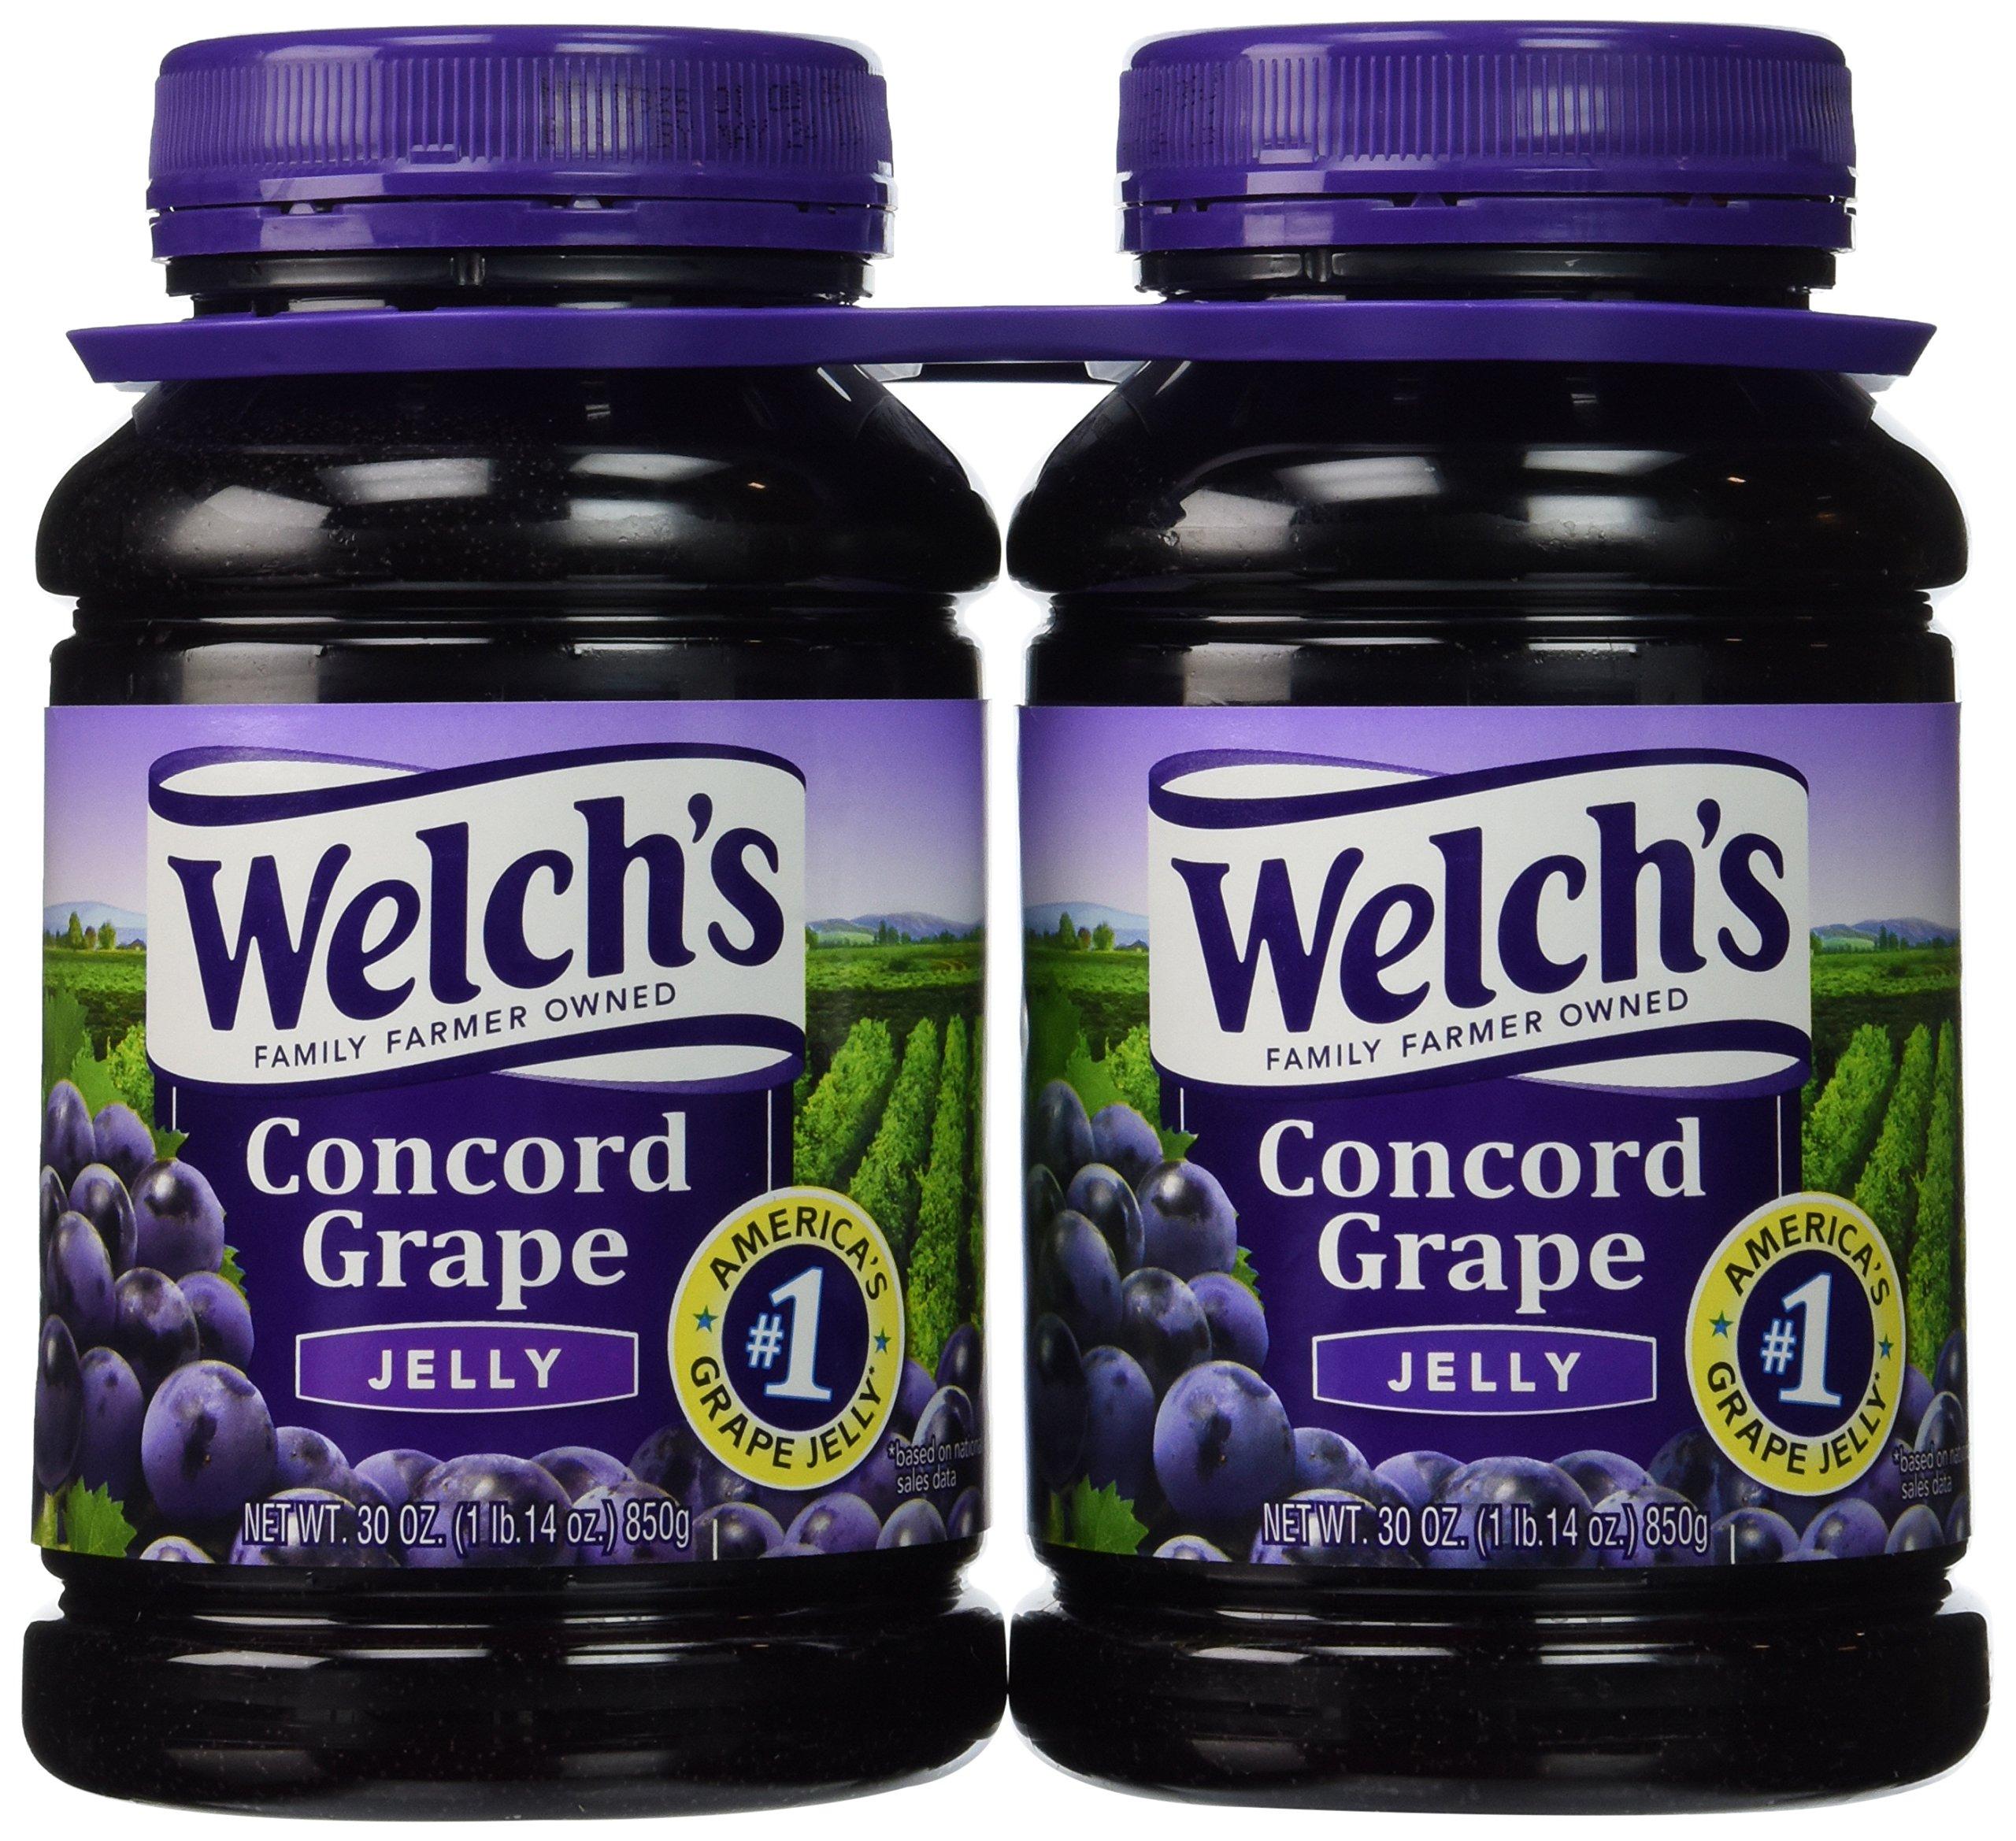 Welch's Concord Grape Jelly (30 oz., 2 pk.)